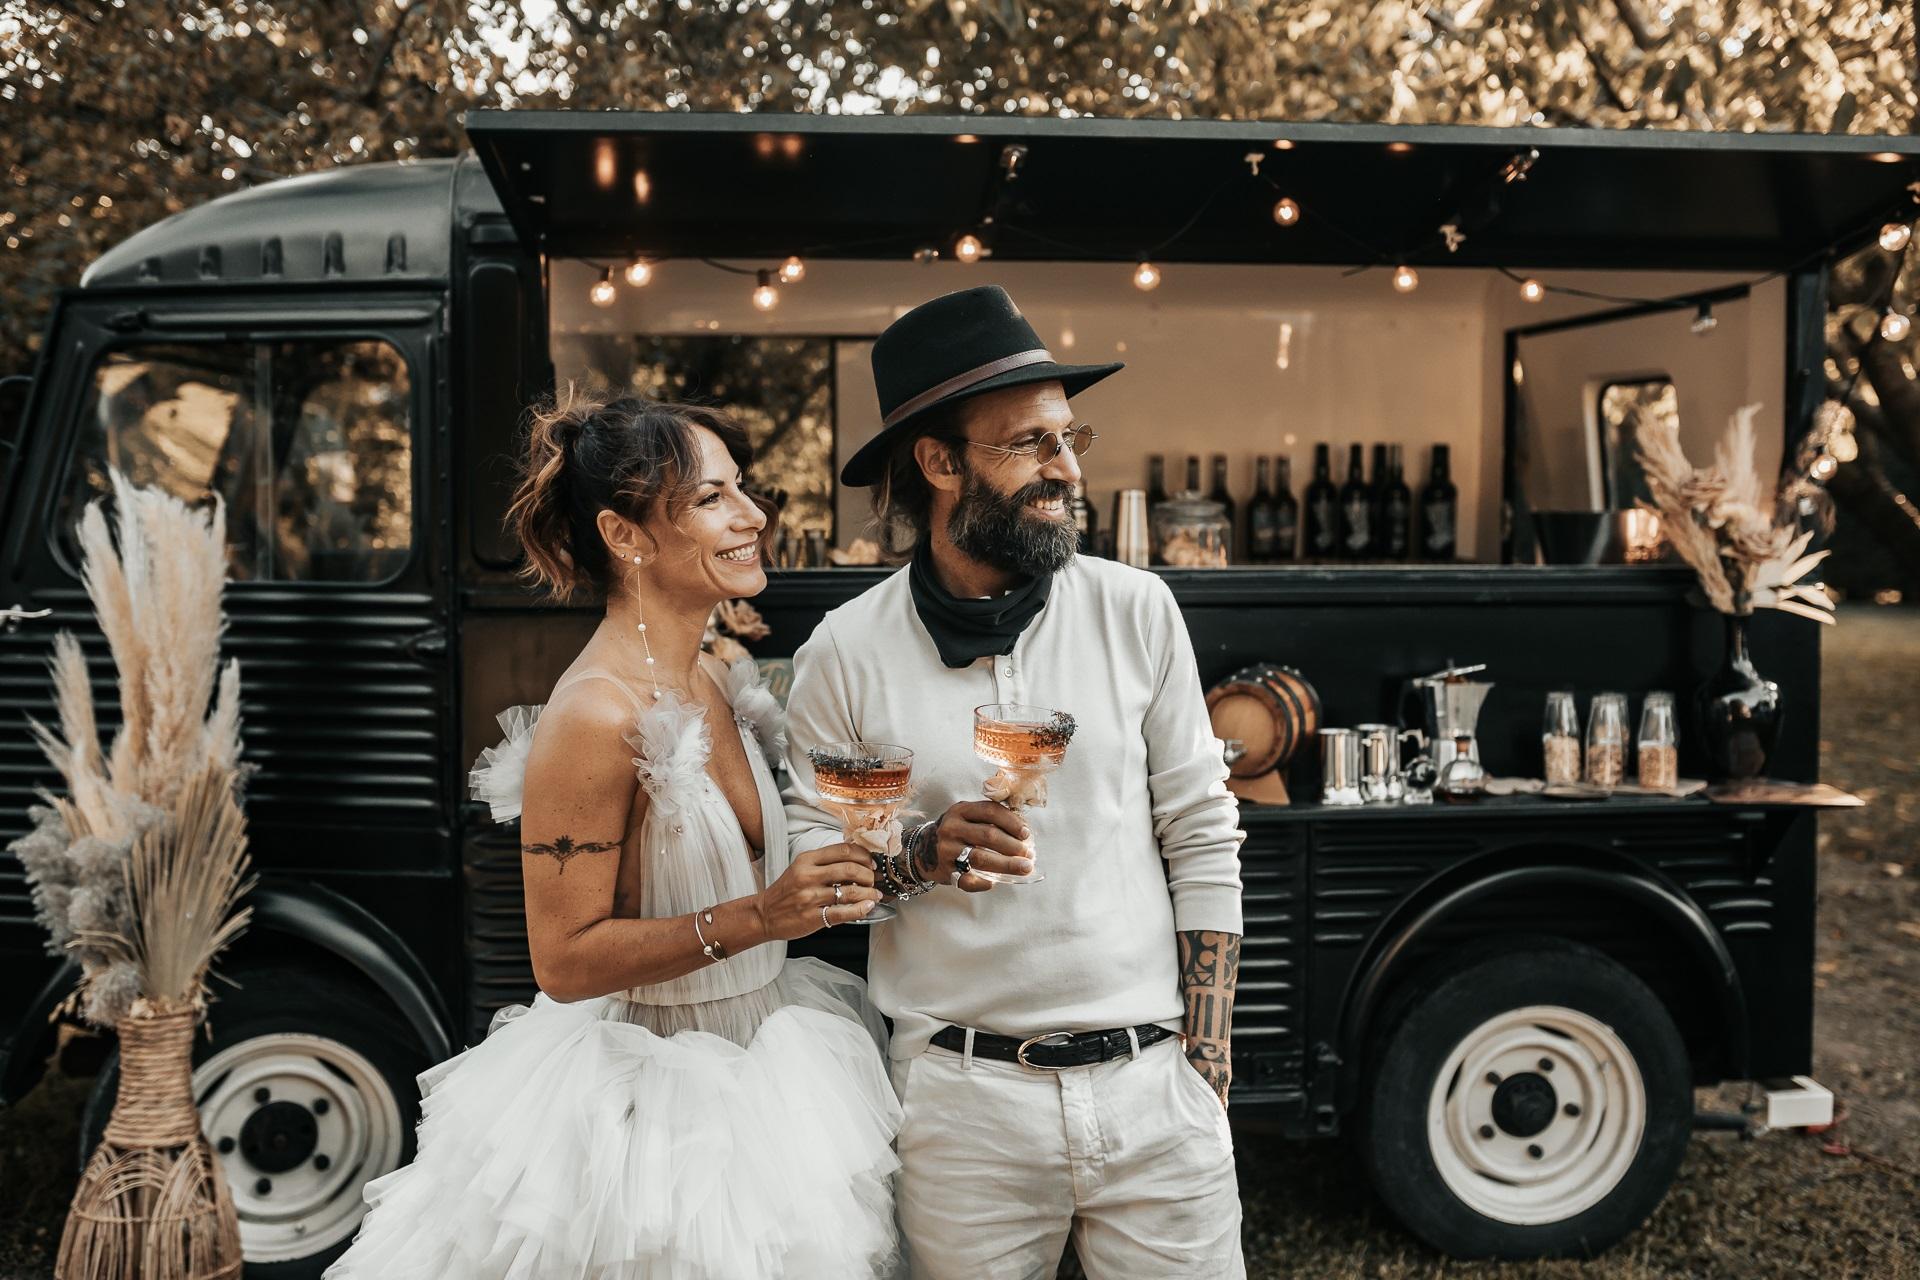 matrimonio alternativo, matrimonio boho chic, stile matrimonio, wedding shooting, boho wedding design